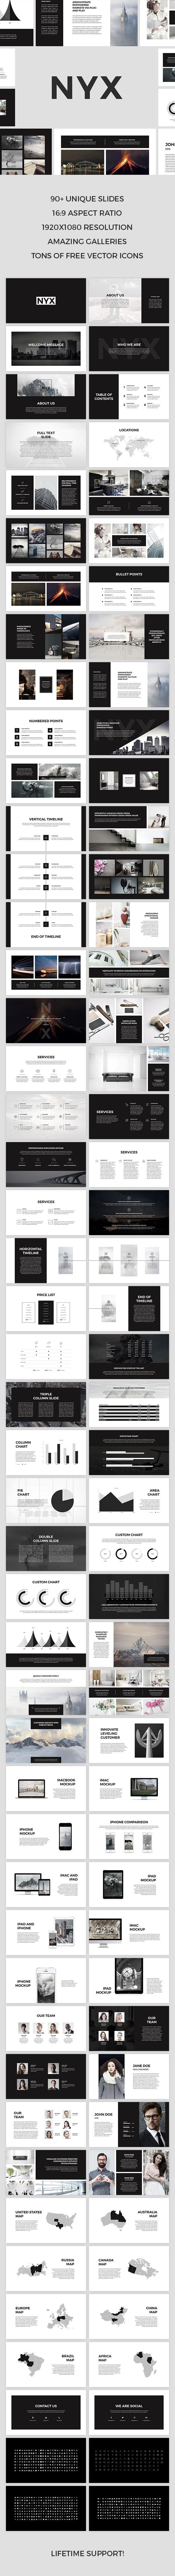 Nyx PowerPoint Template - PowerPoint Templates Presentation Templates